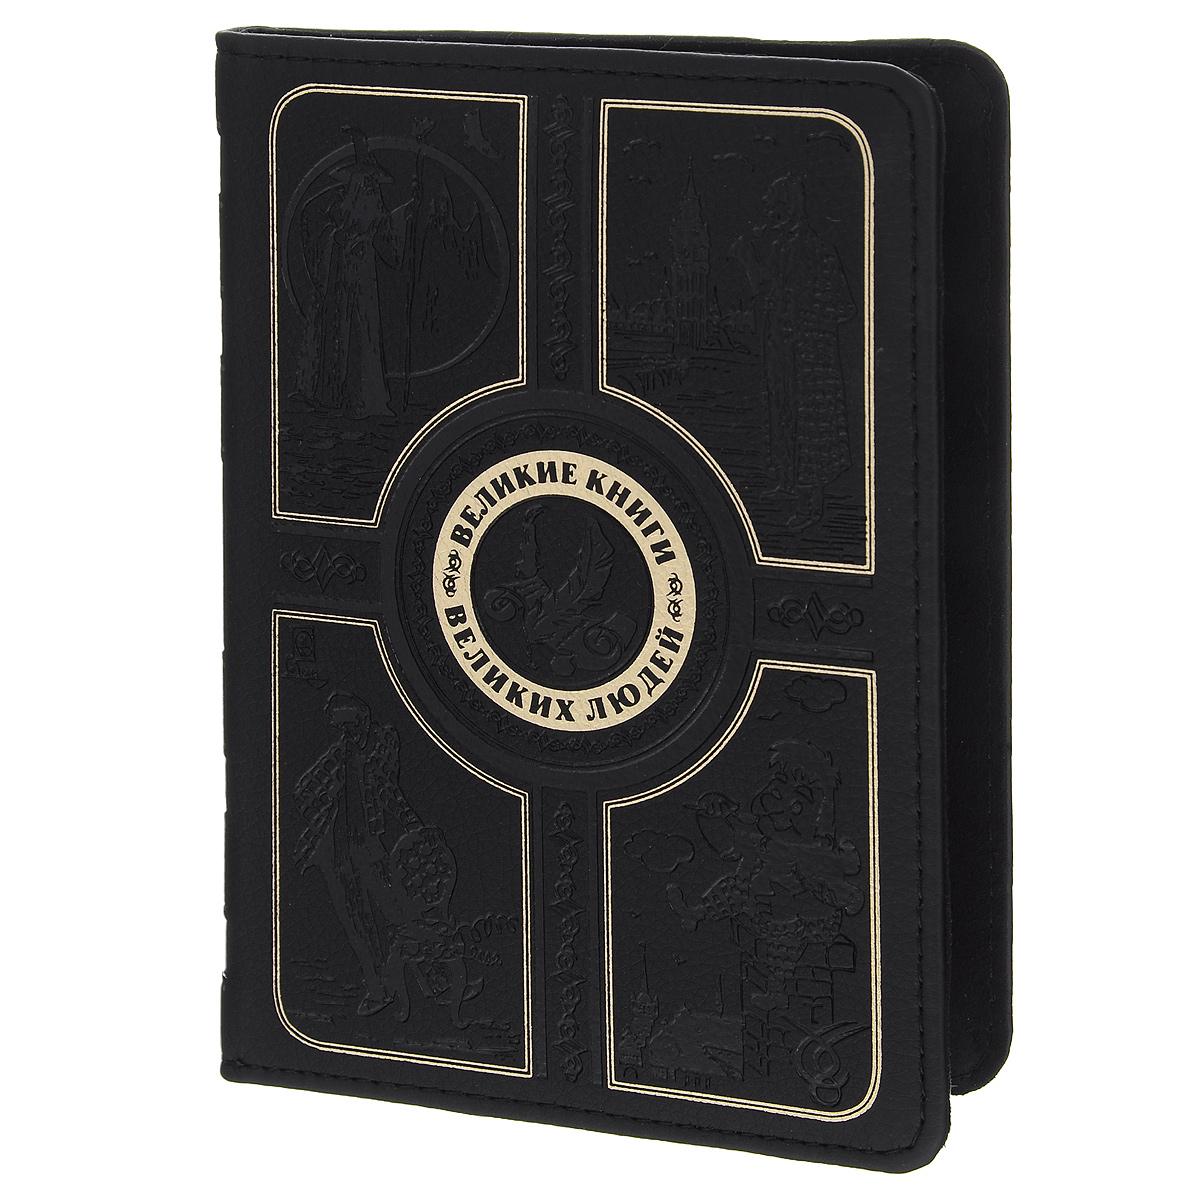 "Vivacase Book, Black чехол для электронных книг 6"" VUC-CBK01-bl"